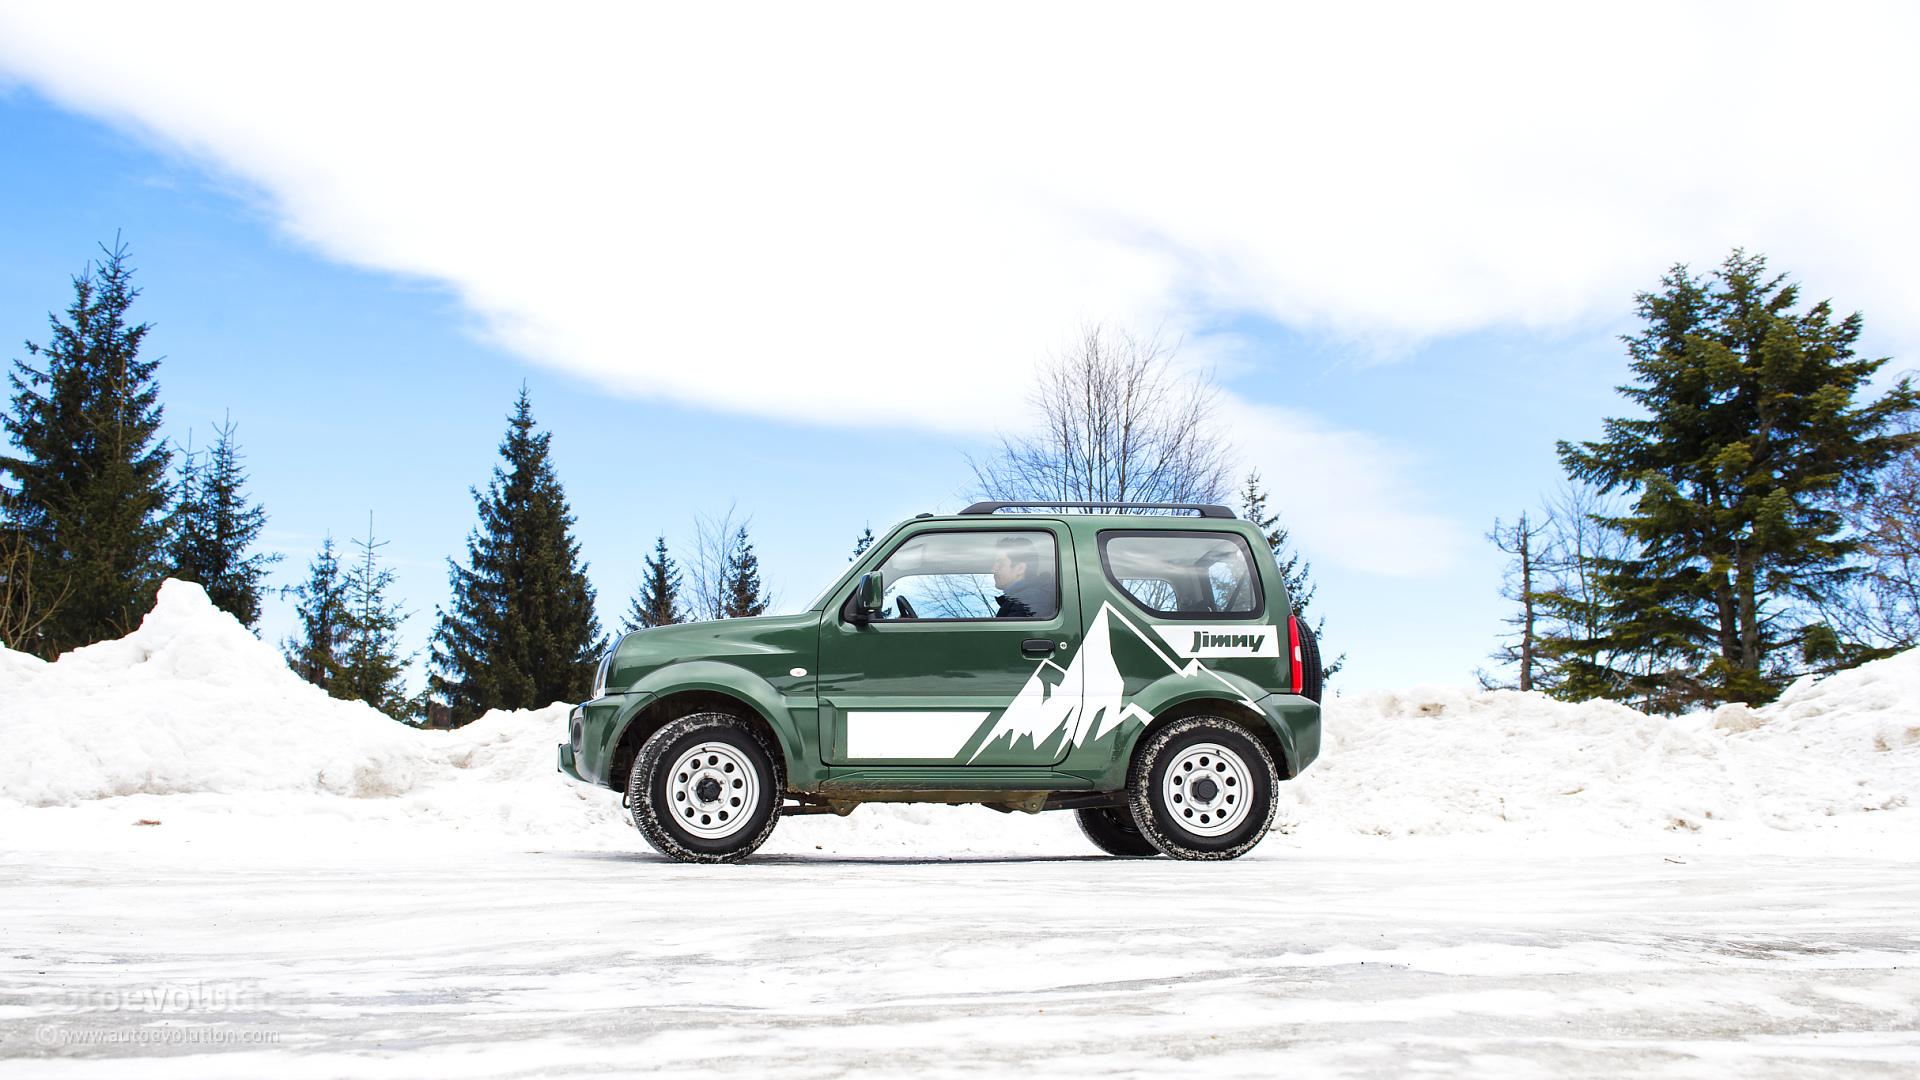 Off Road Jeep Hd Wallpaper >> Suzuki Jimny HD Wallpapers: More David than Goliath - autoevolution